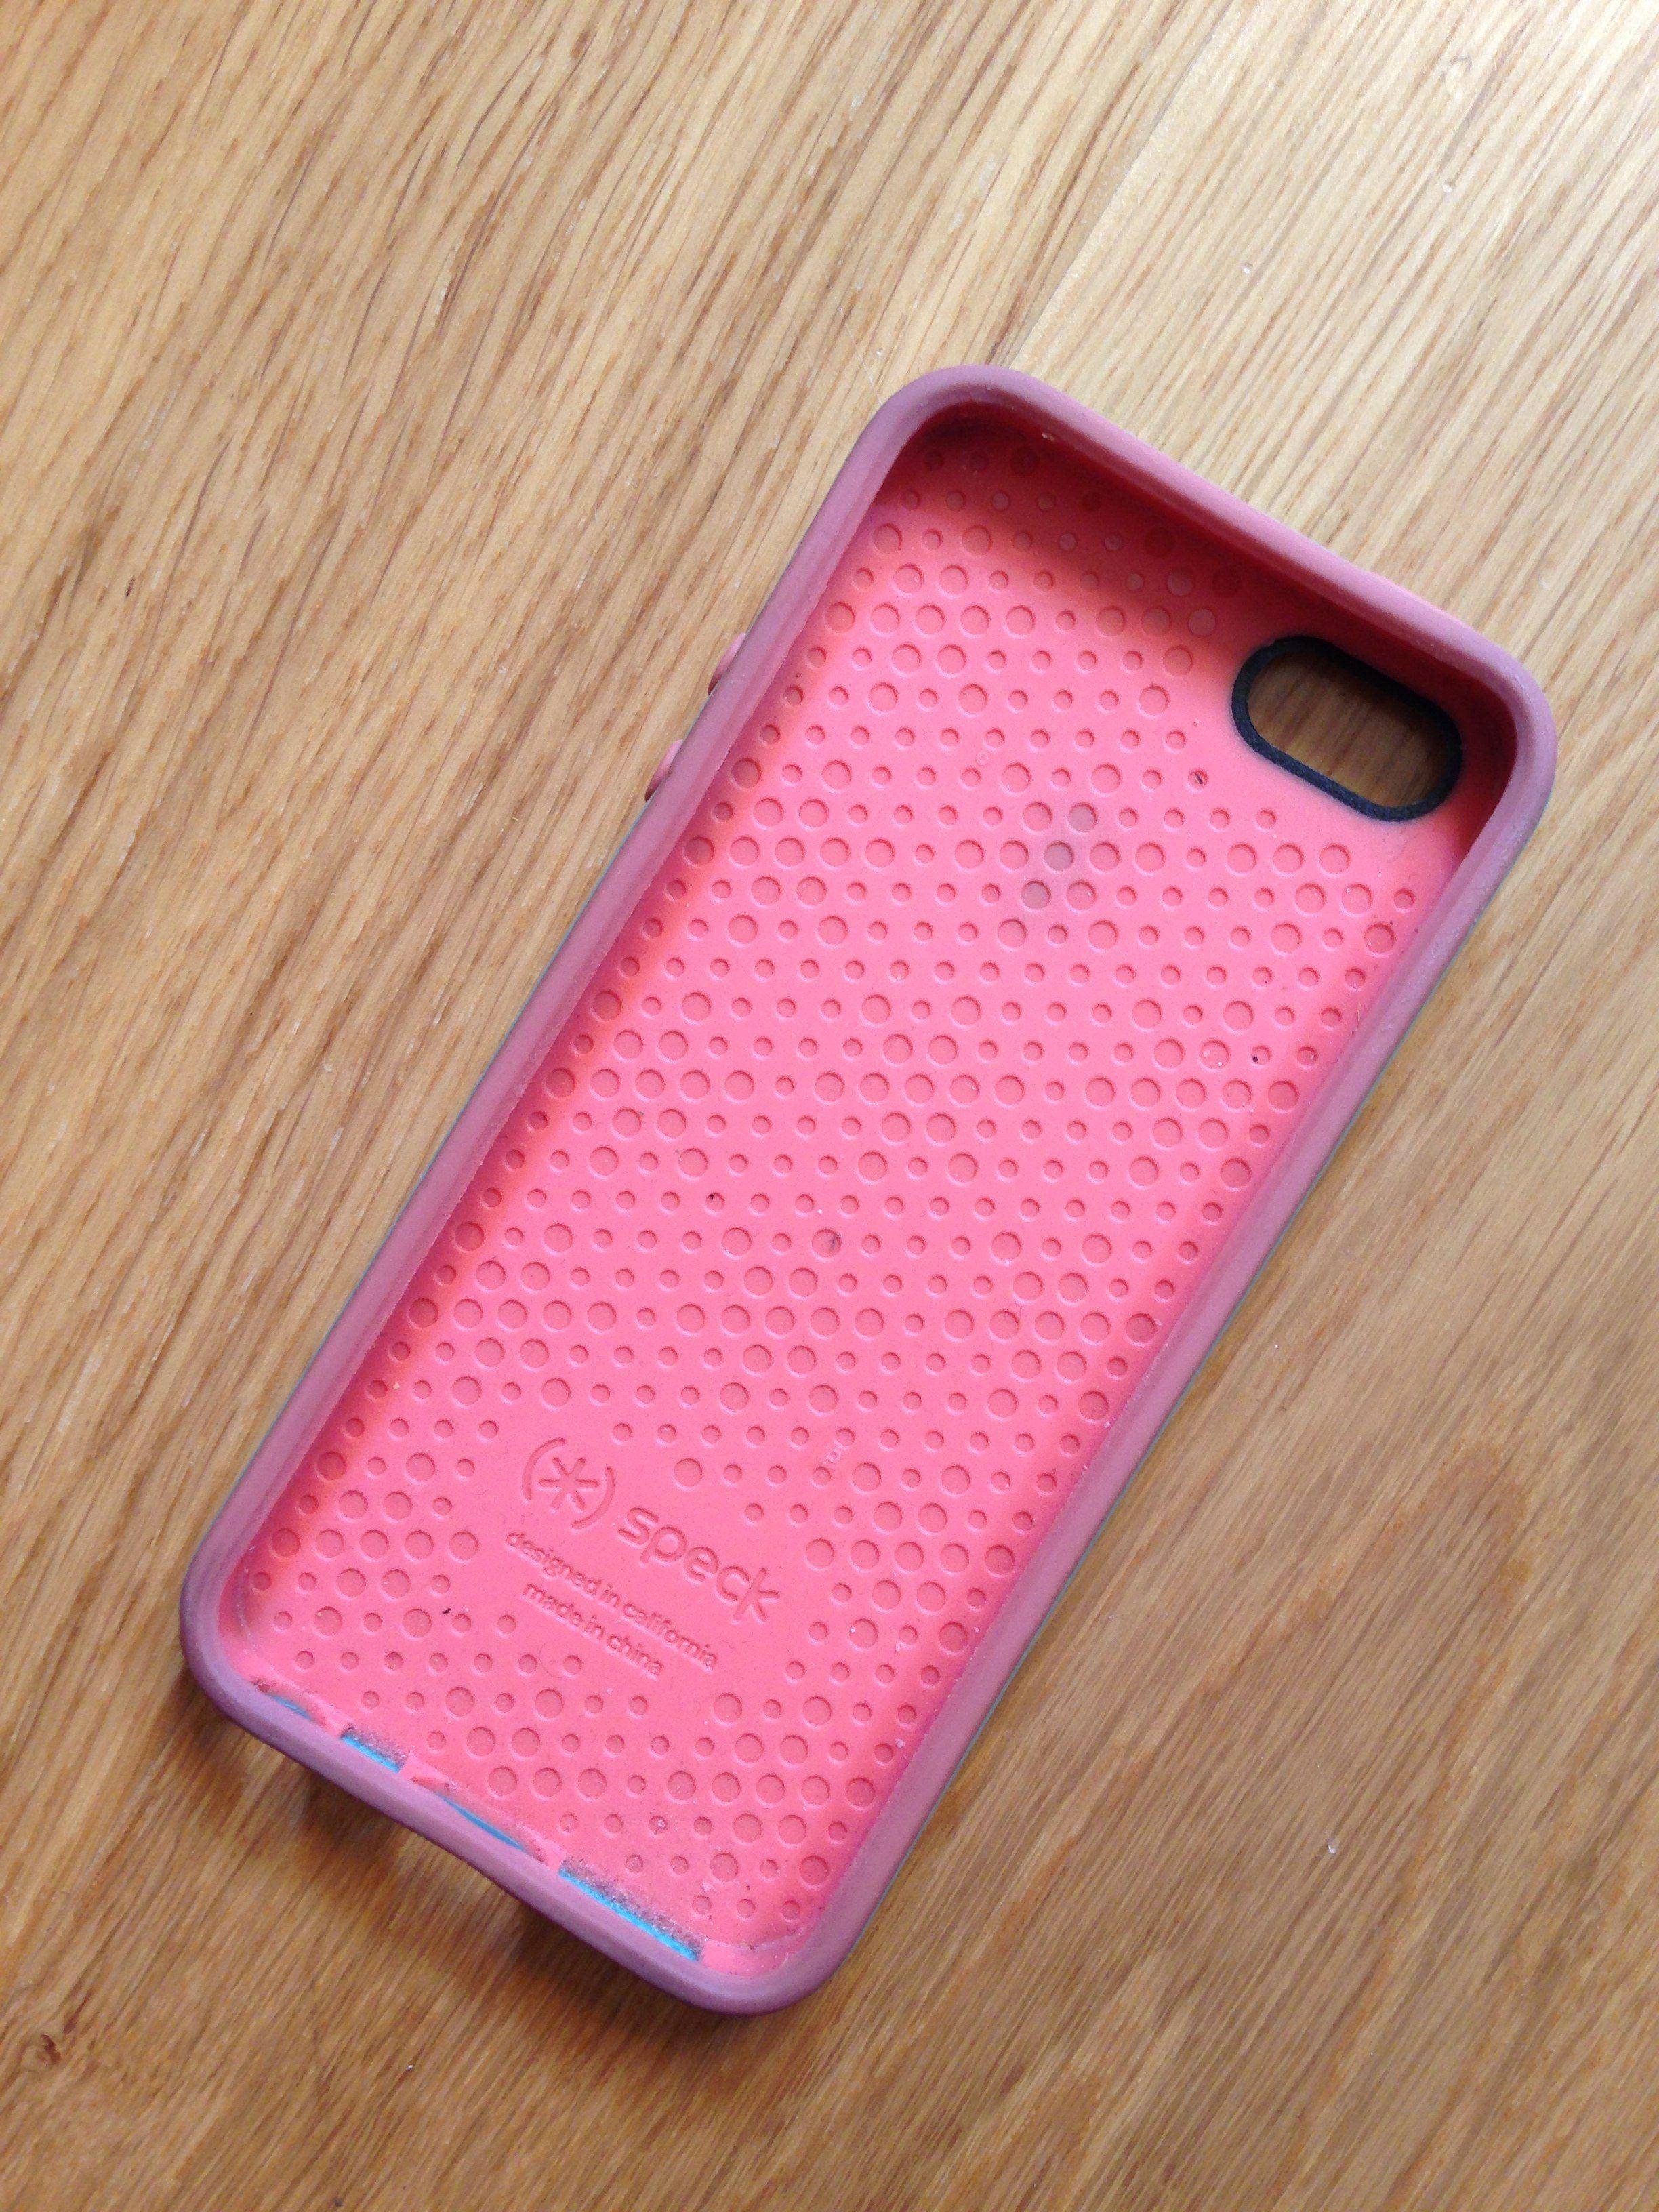 iphone 5 Speck case cover, the myndset digital marketing